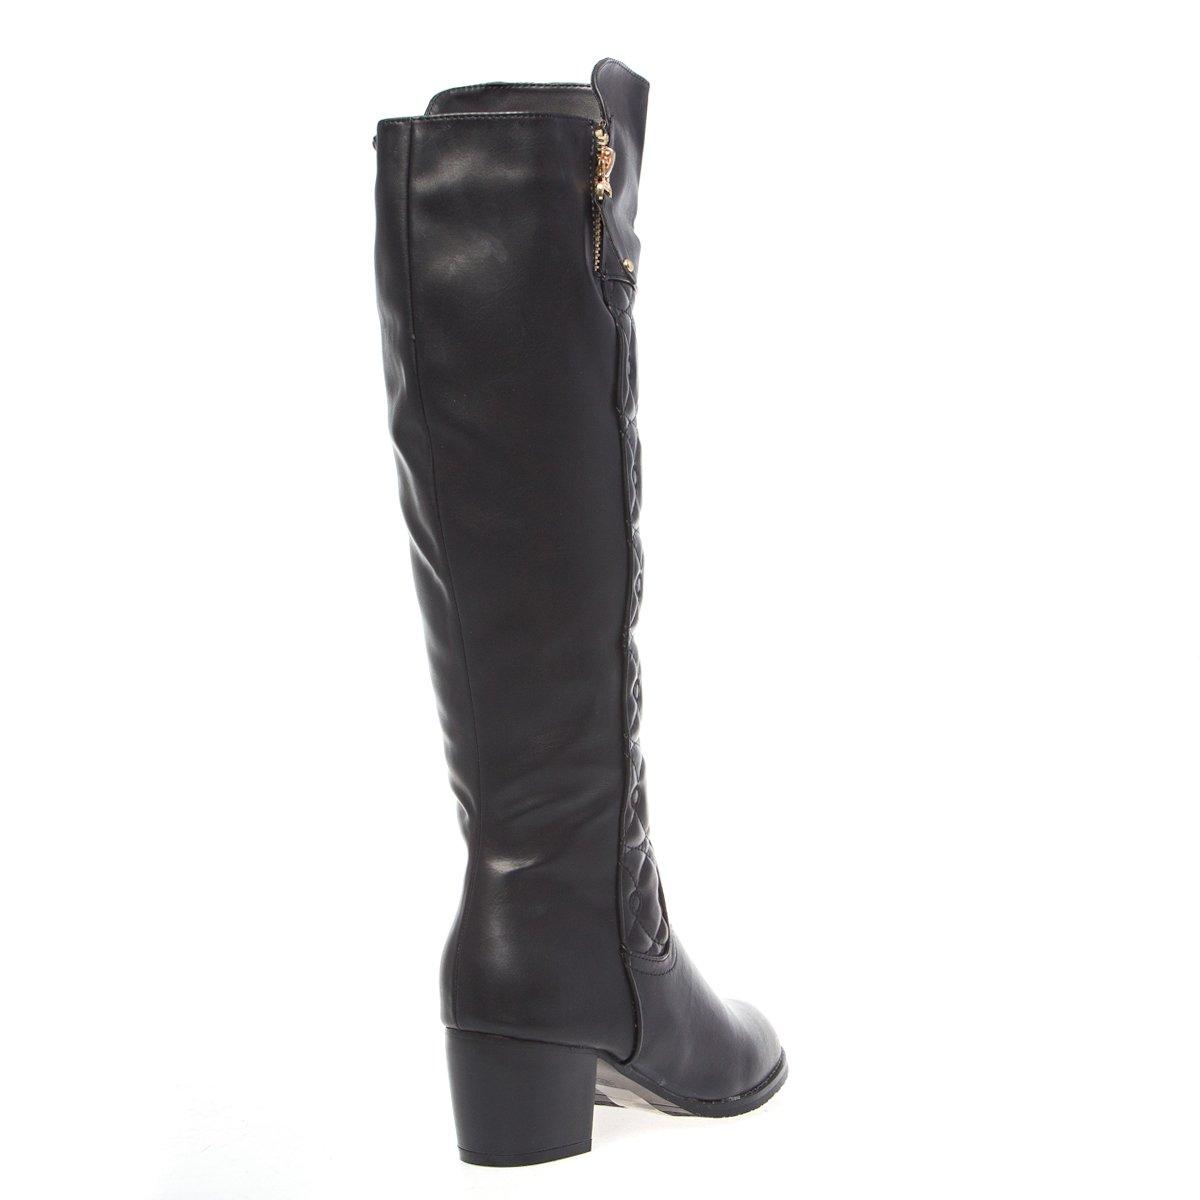 V-Luxury Womens 18-KAYLIN08 Round Toe Medium Heel Knee High Boot Shoes Black PU Leather